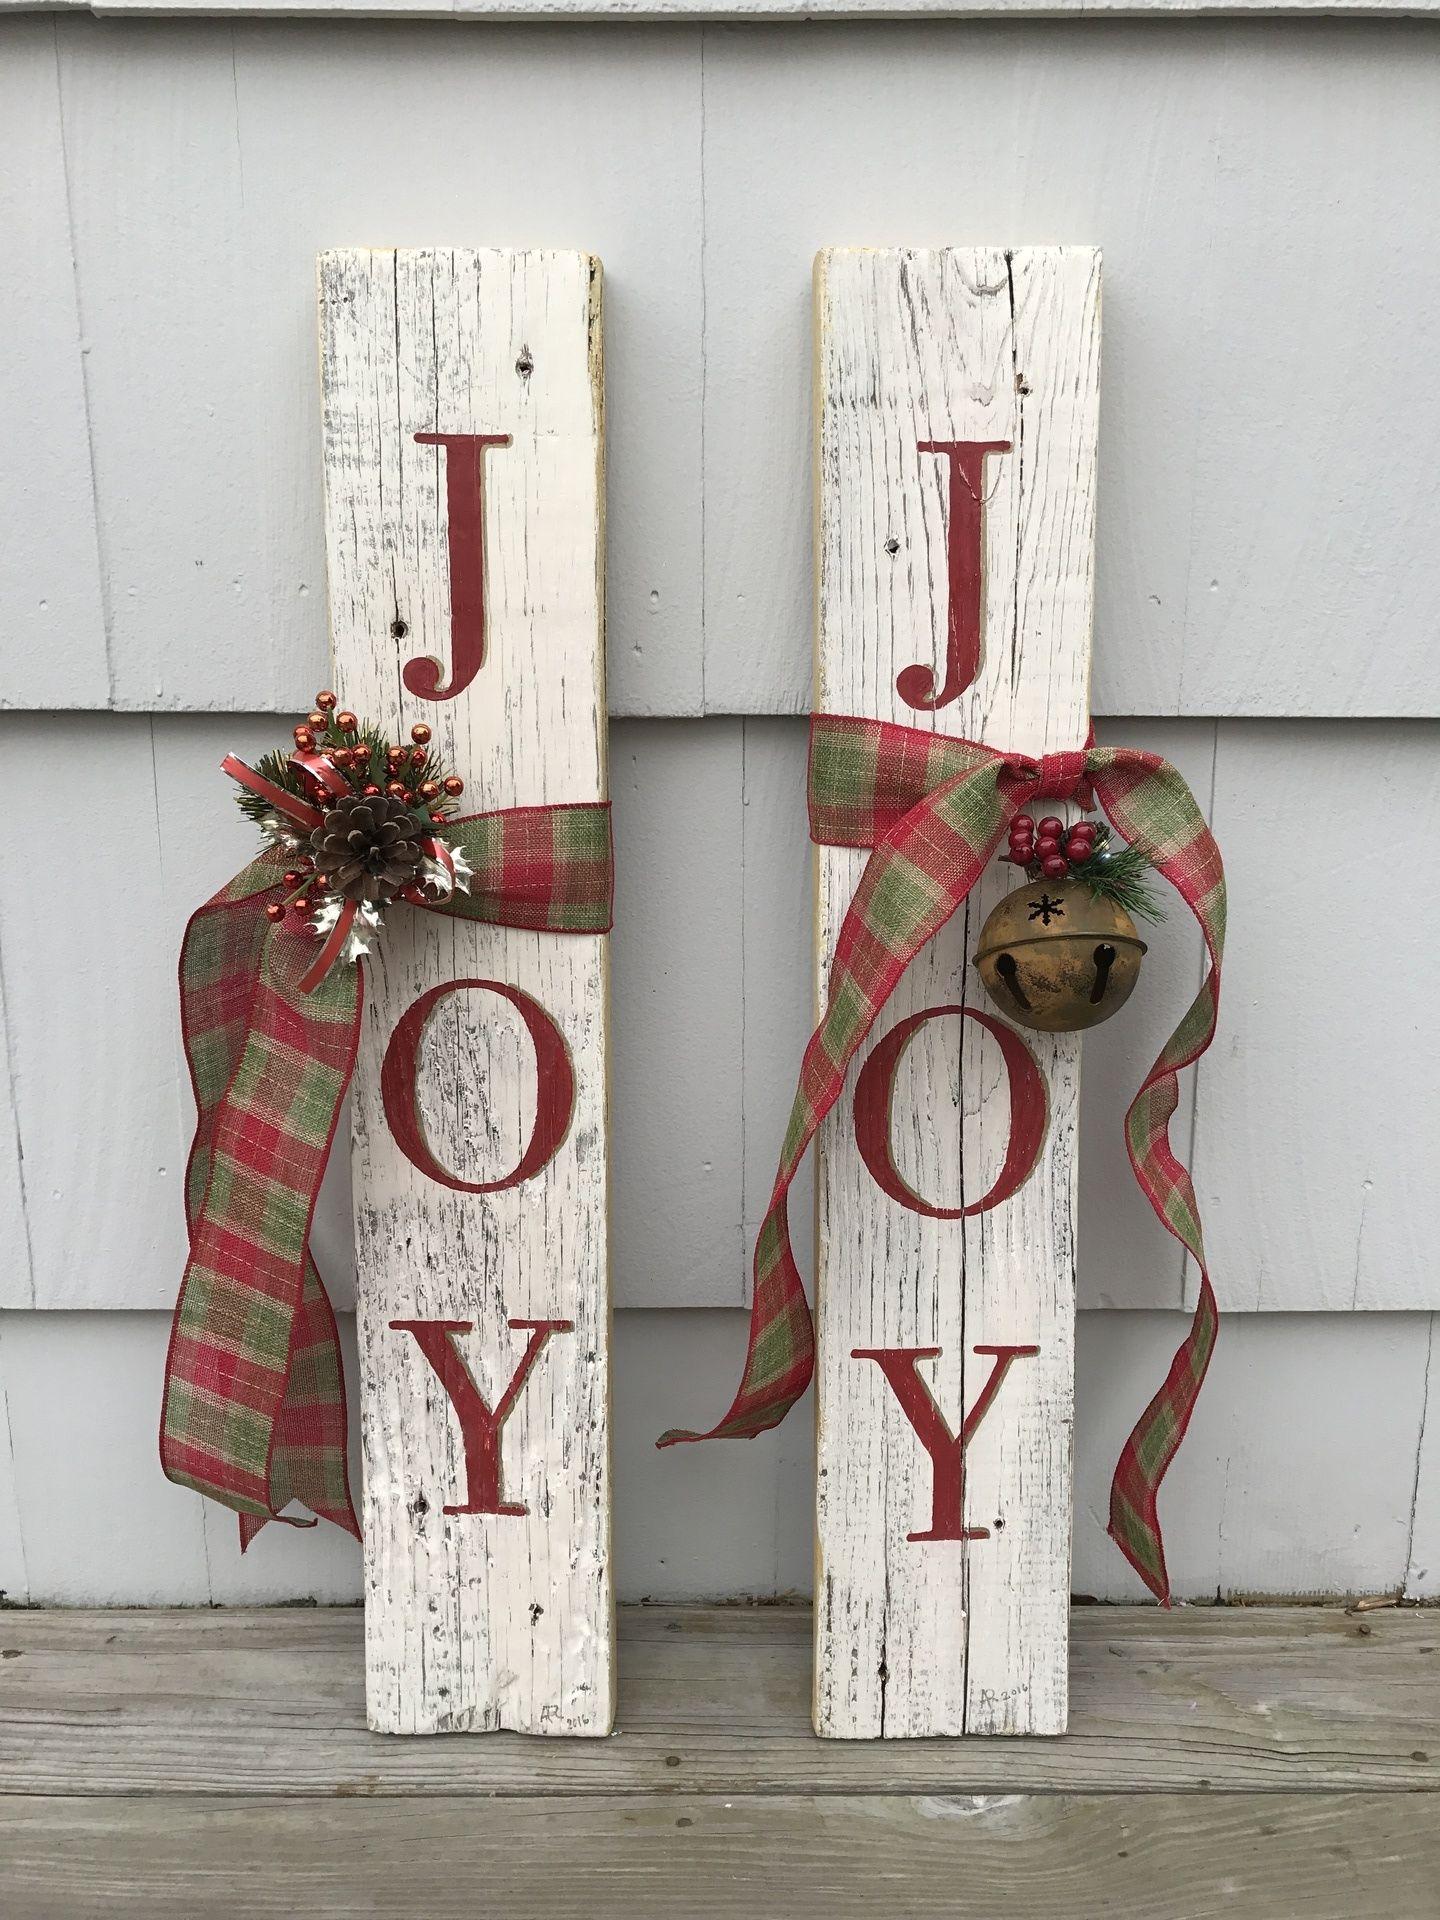 Joy Signs Frontporchchristmasdecor Joy Christmassigns